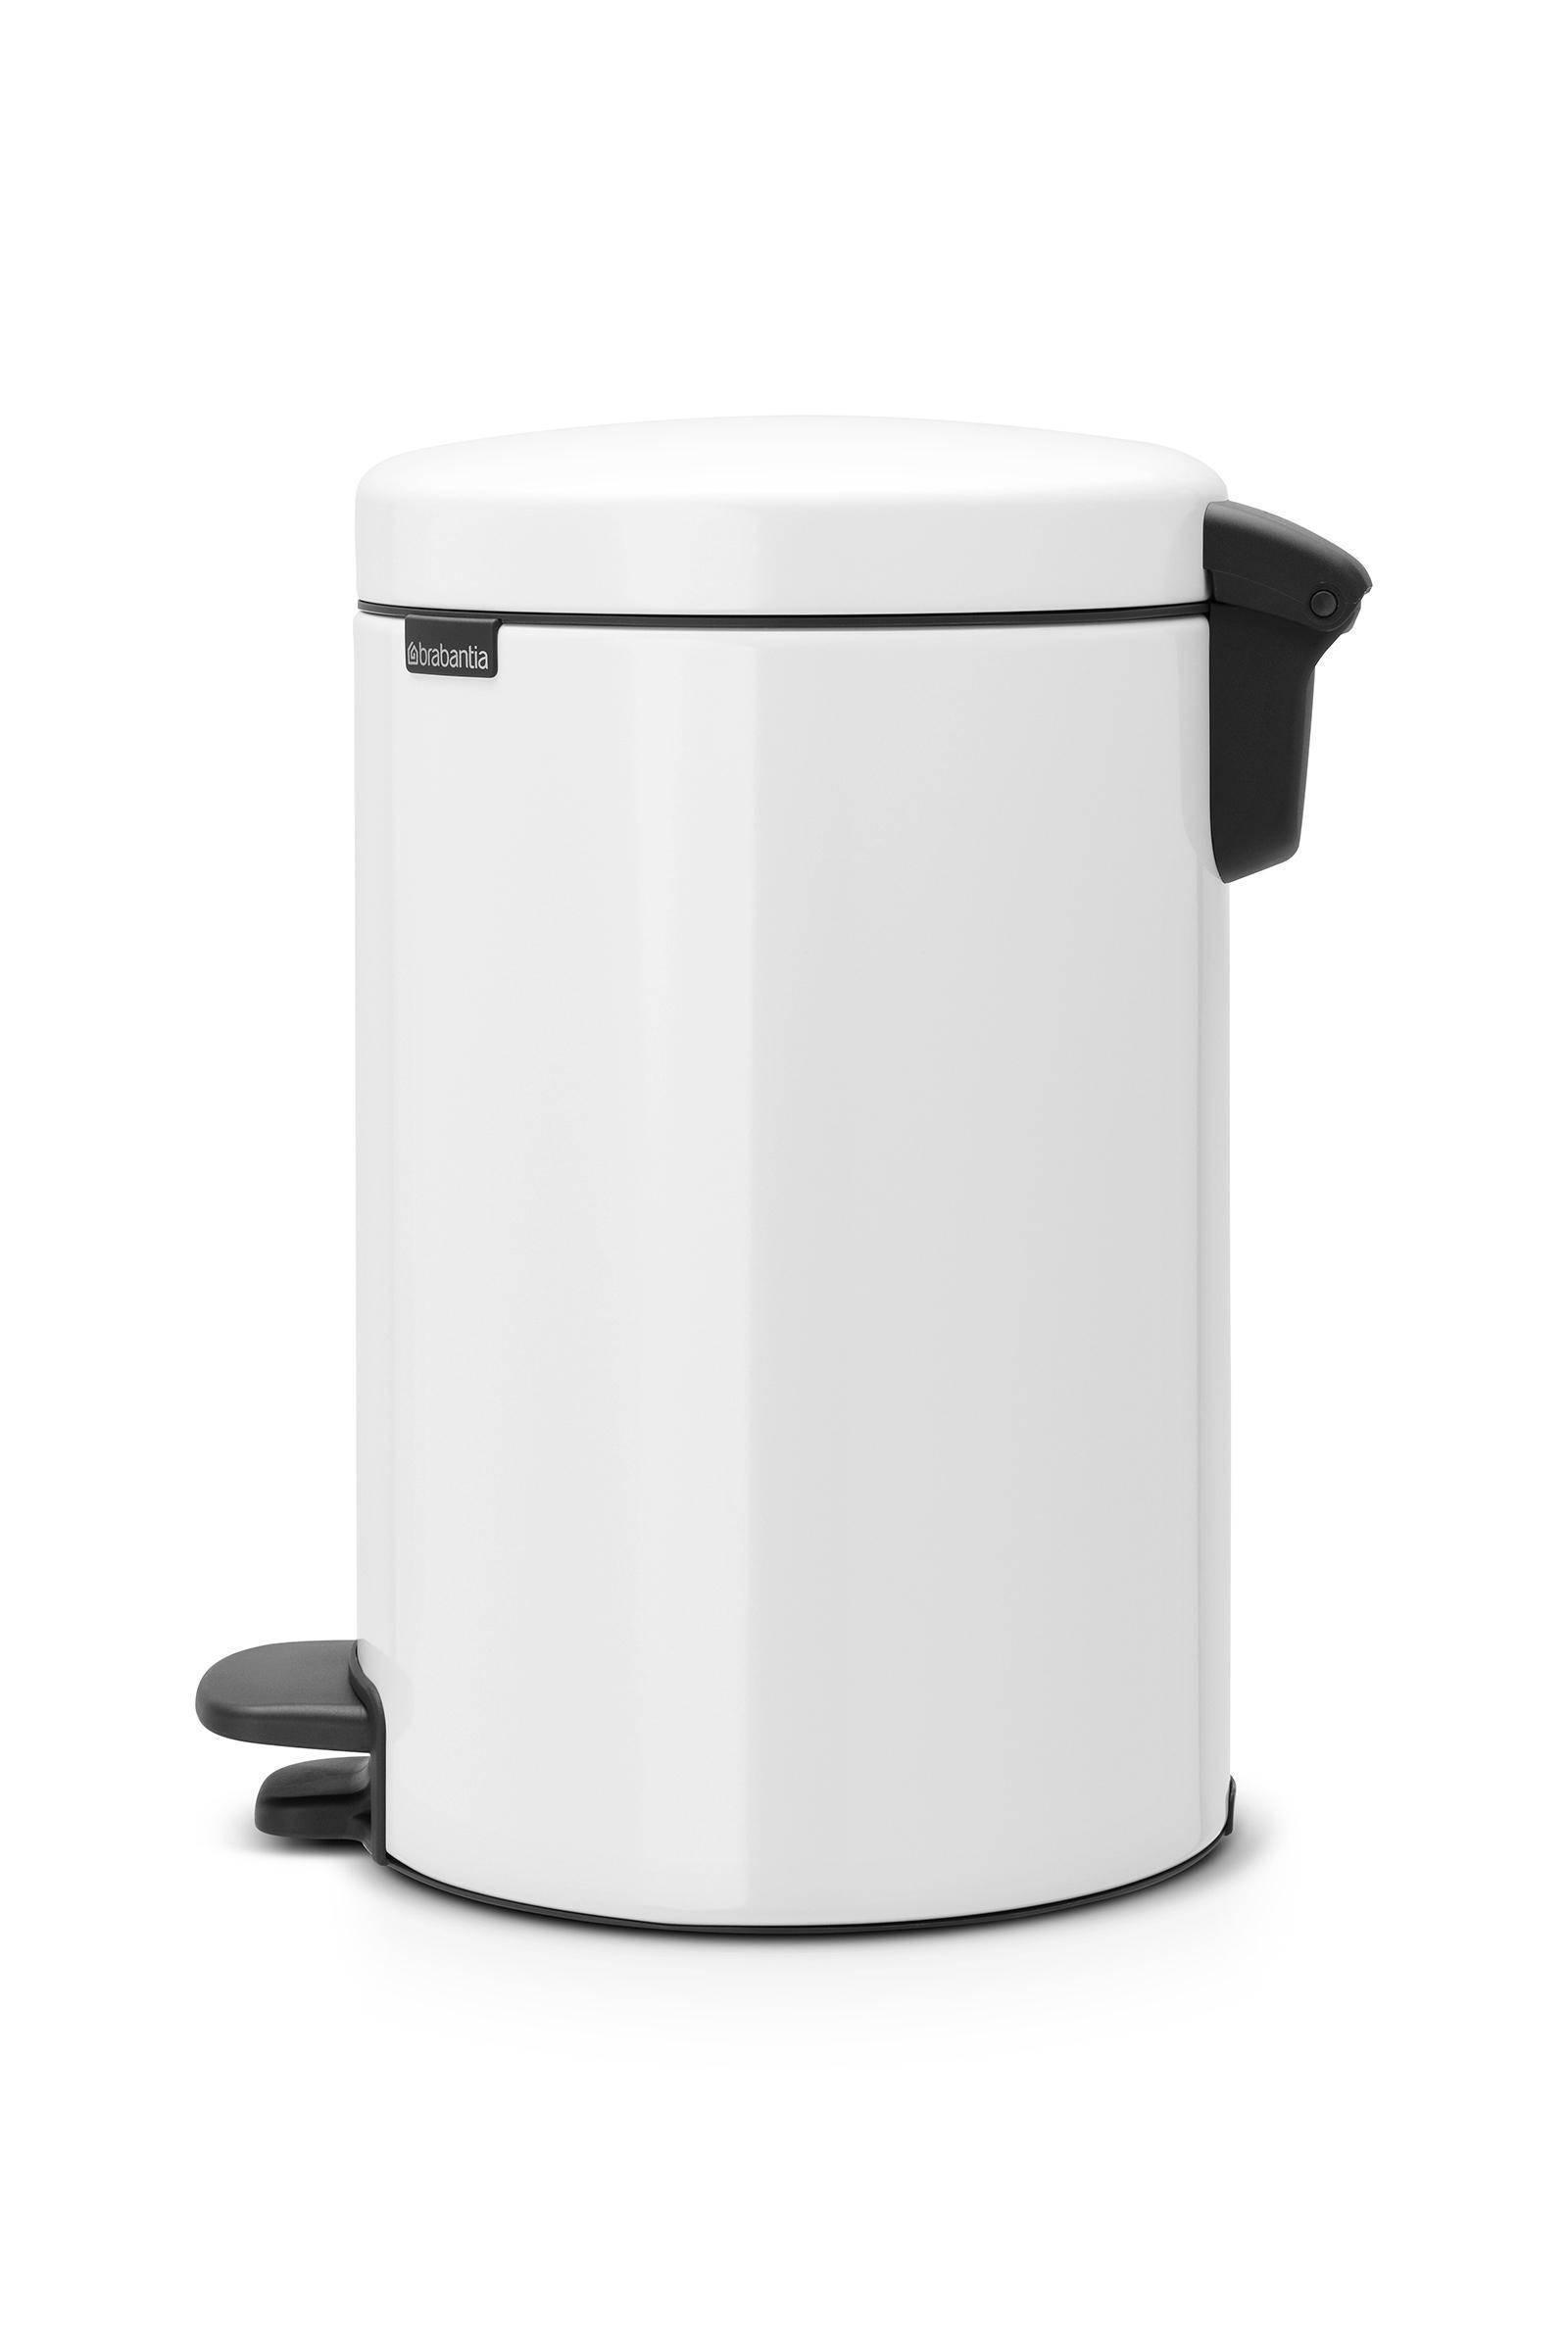 Favoriete Brabantia newIcon pedaalemmer 12 liter | wehkamp LO73